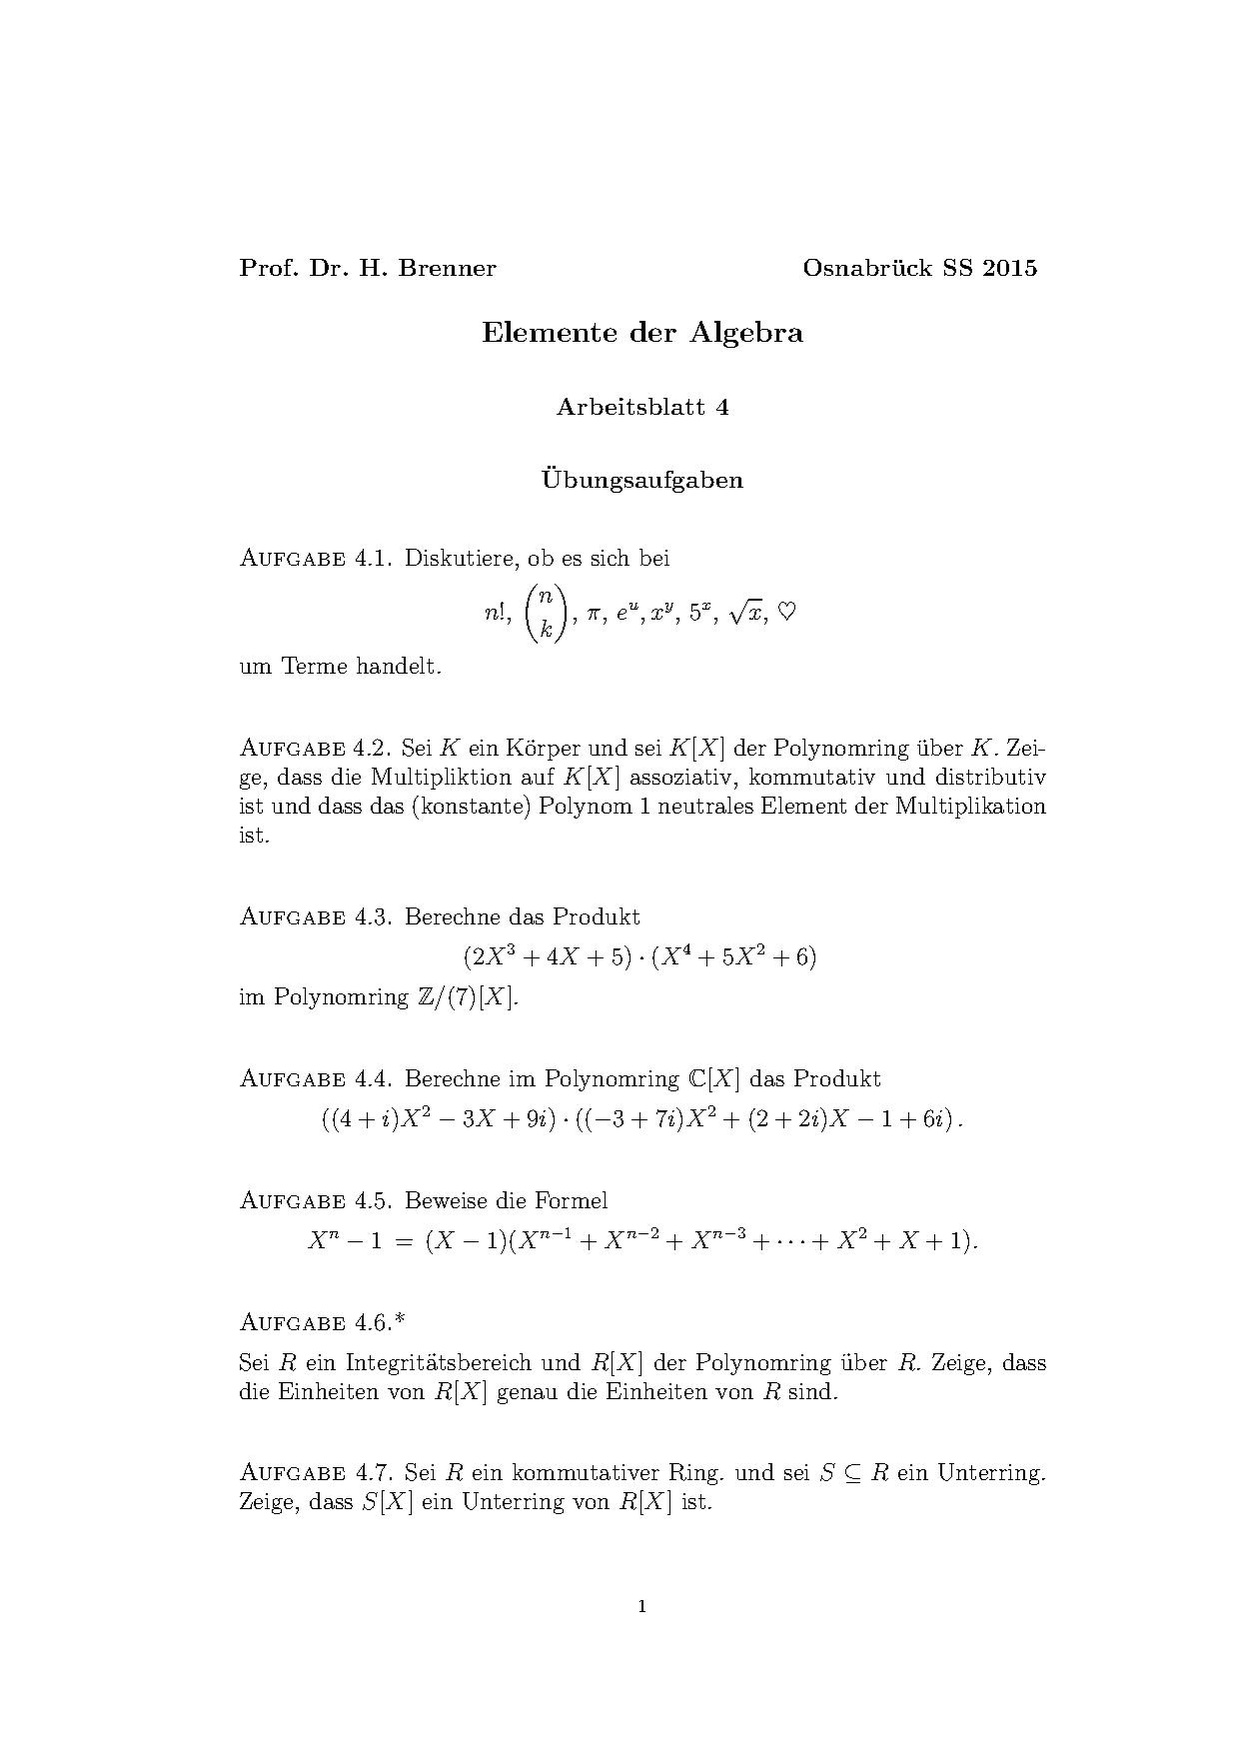 File:Elemente der Algebra (Osnabrück 2015)Arbeitsblatt4.pdf ...